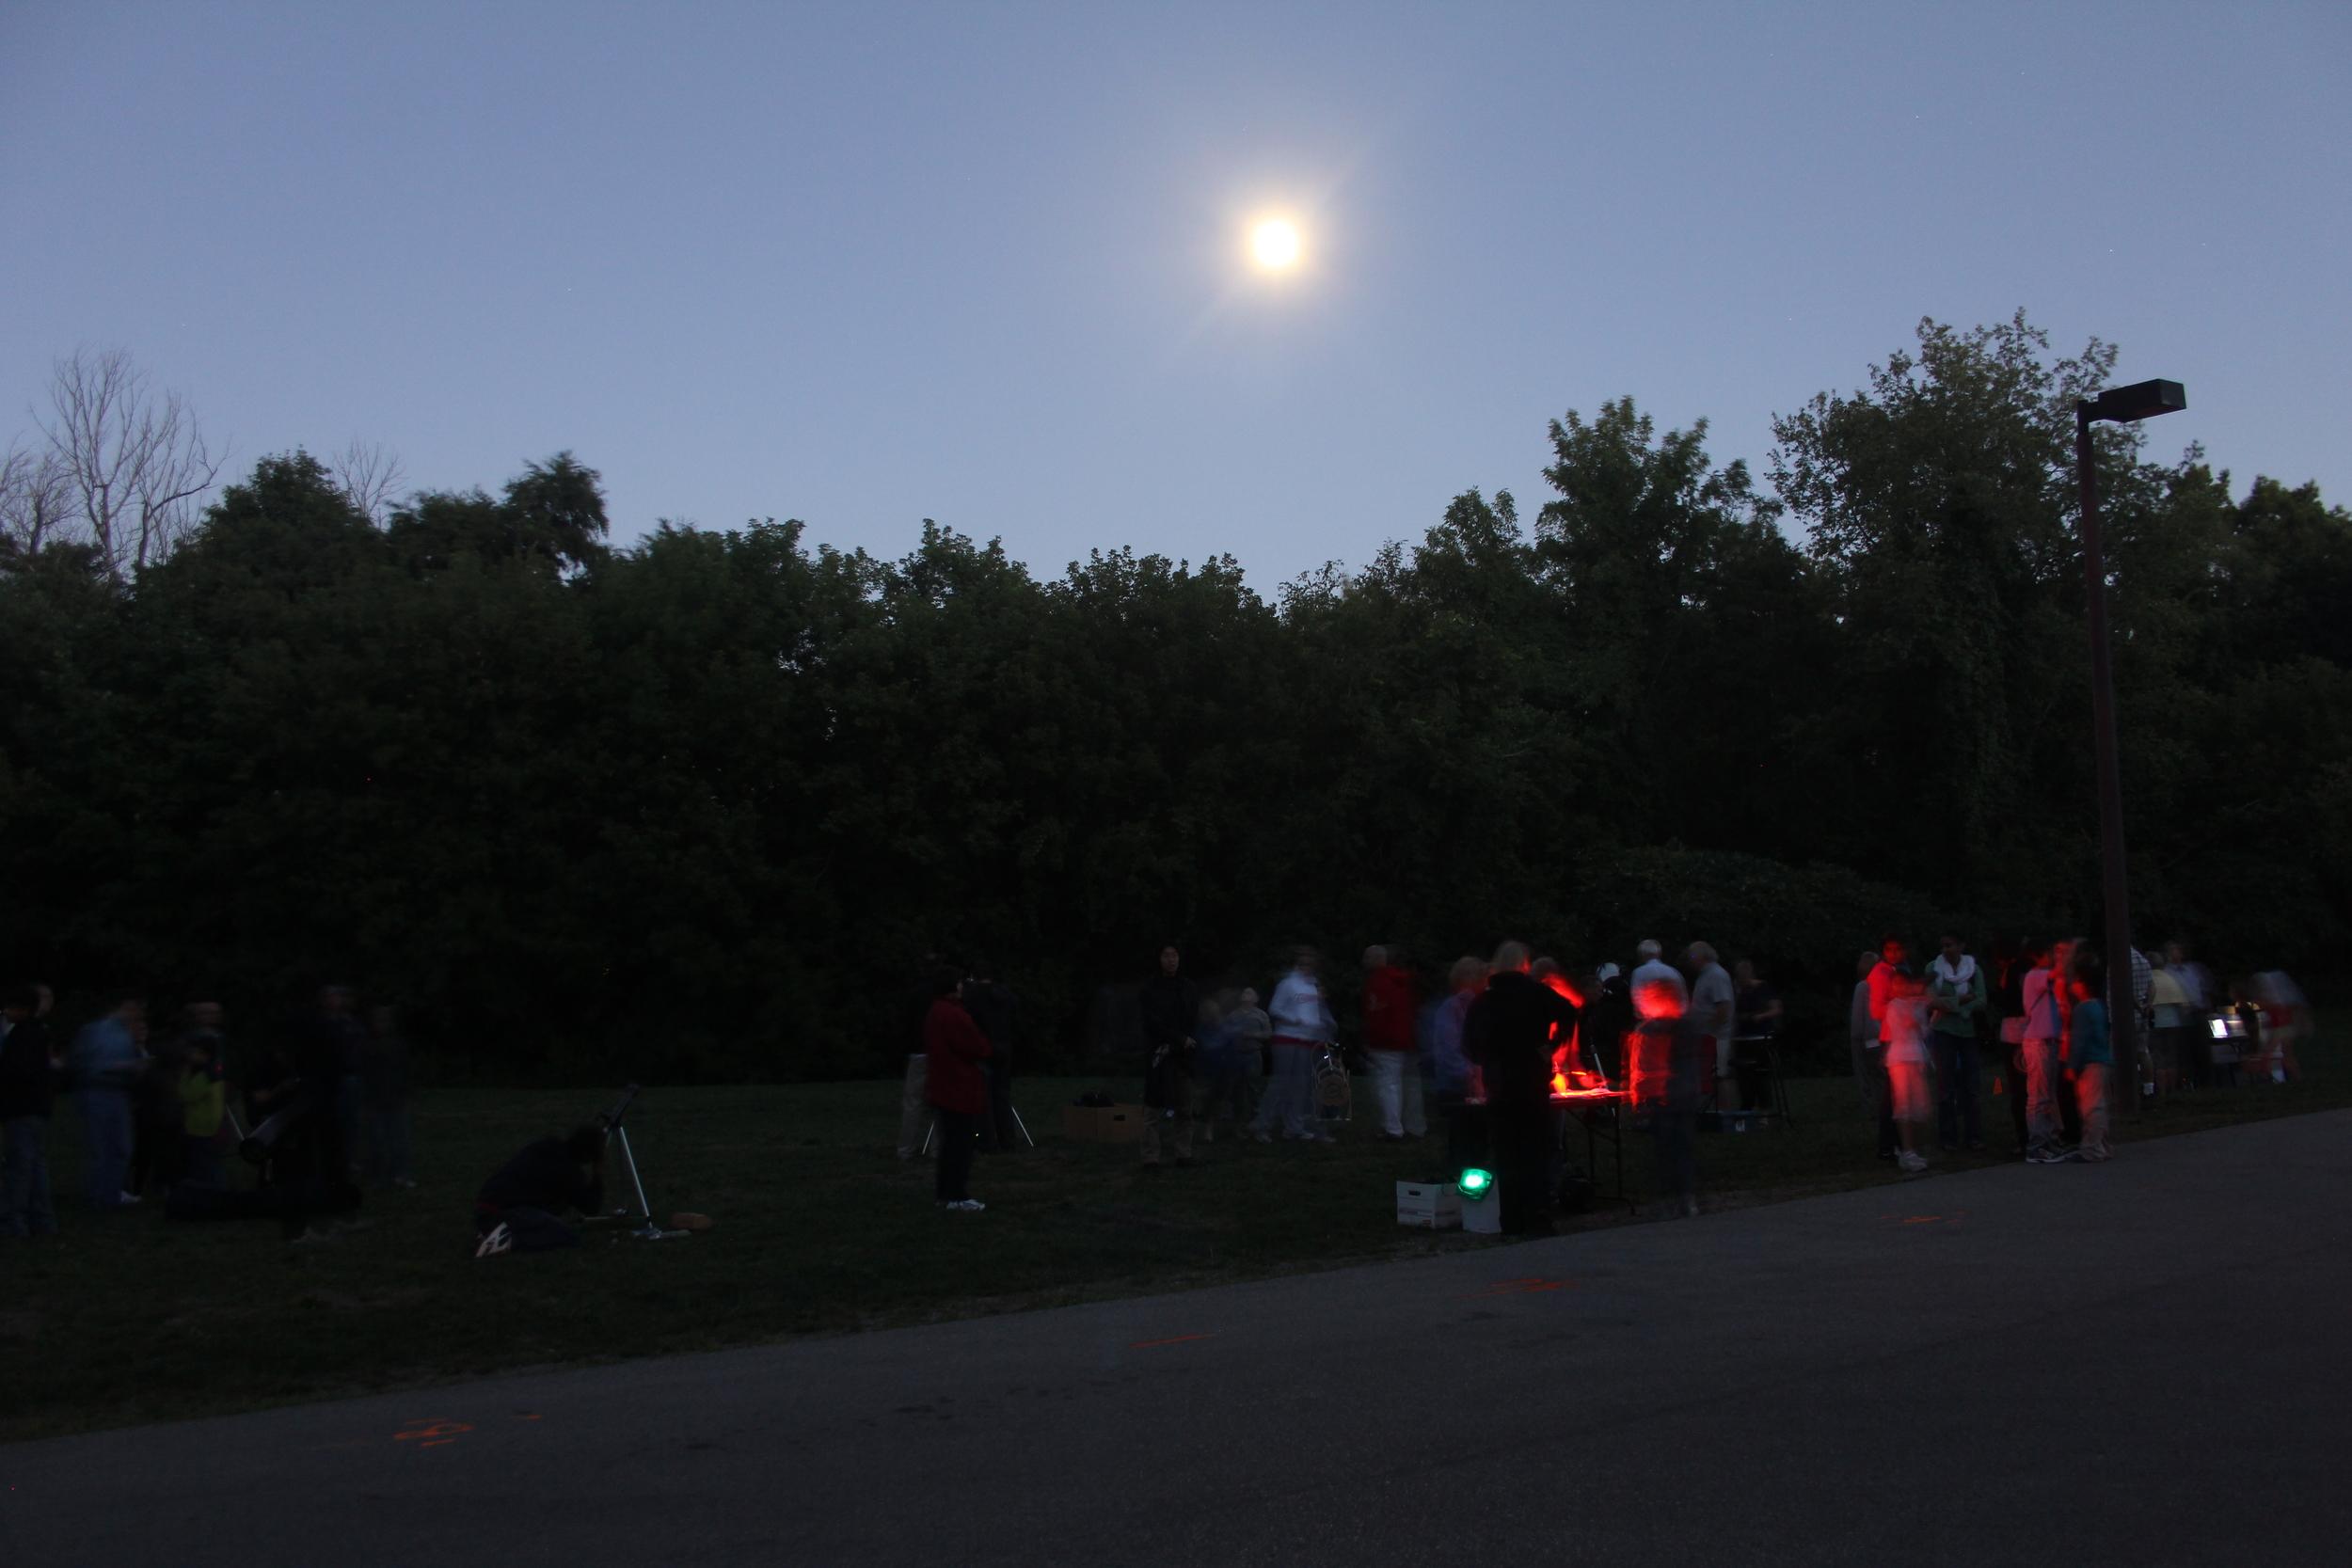 Telescopes set up at Riverwood to look at the Moon.